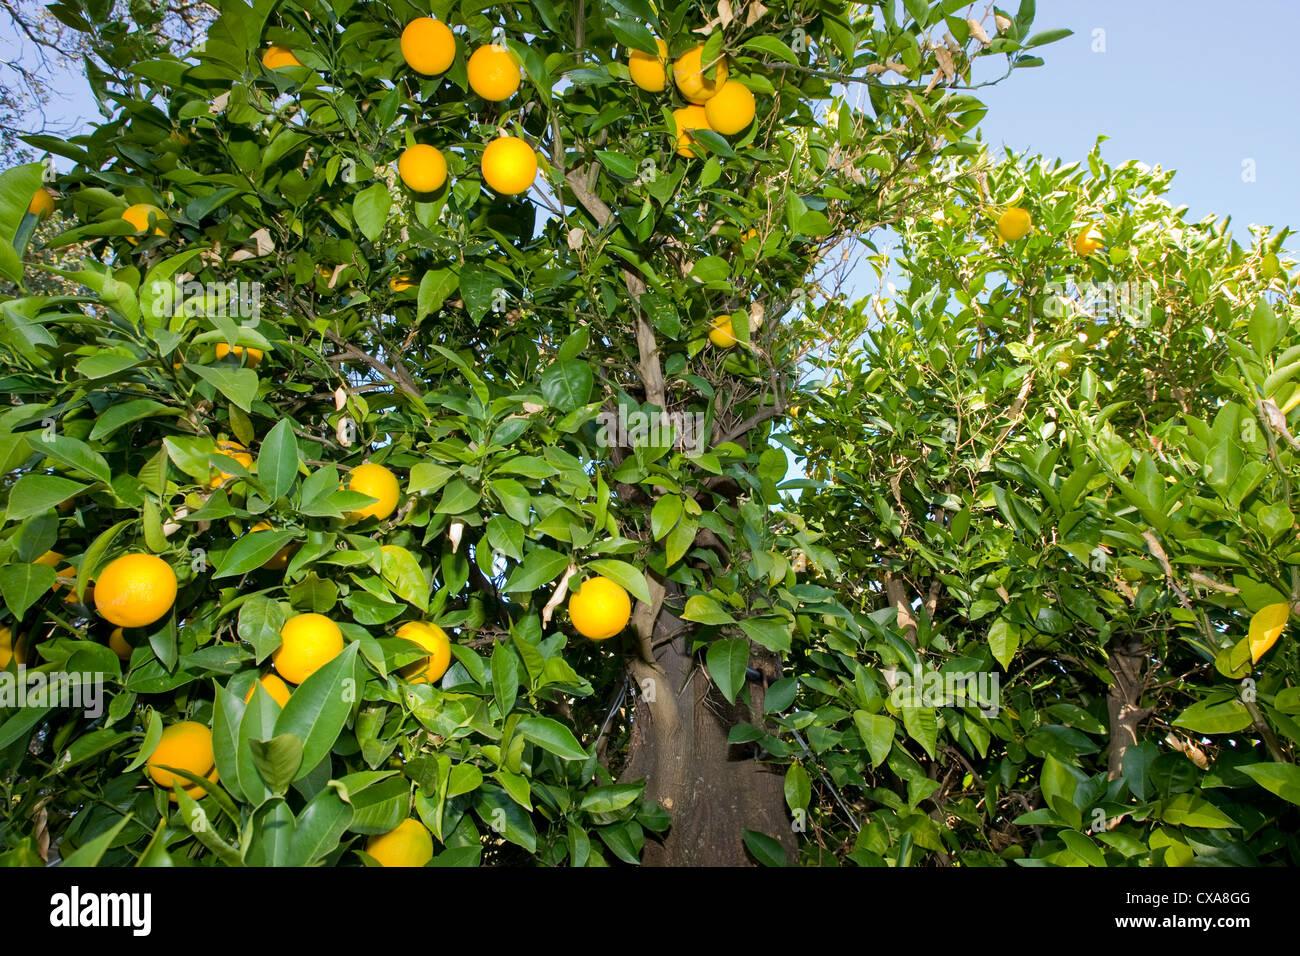 An orange fruit tree in California. Stock Photo